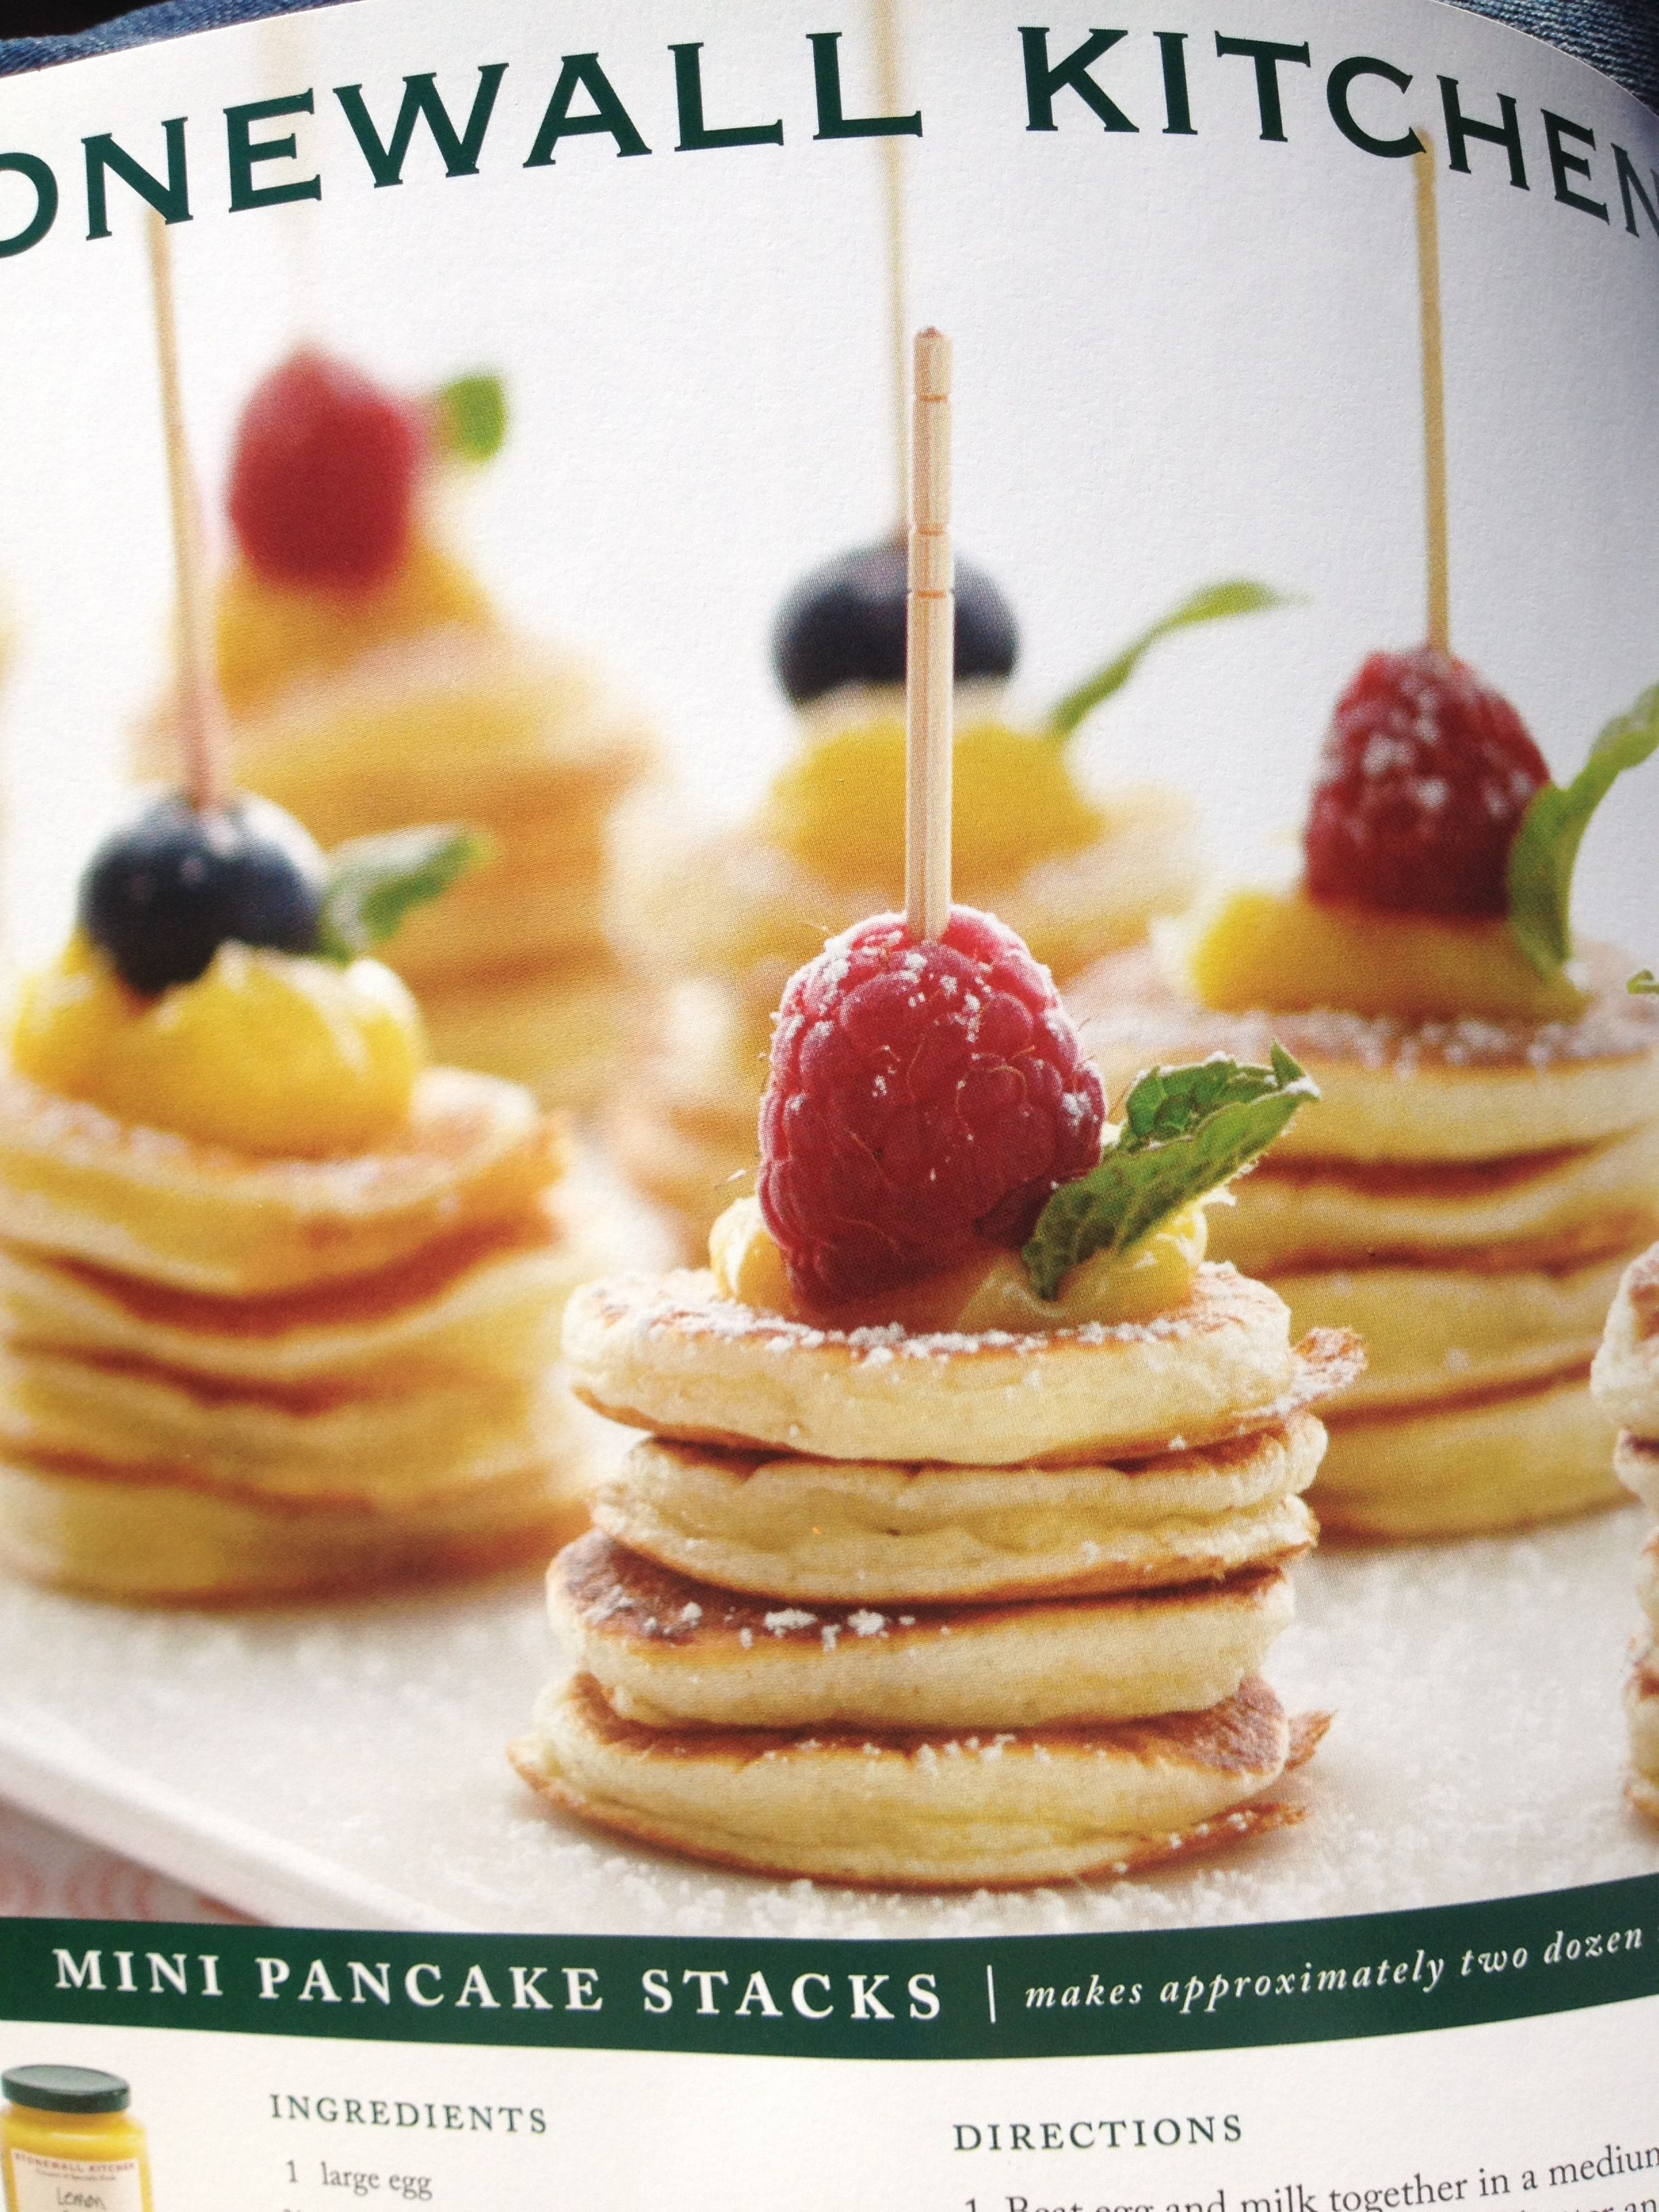 Mini Pancake Stacks perfect brunch finger food